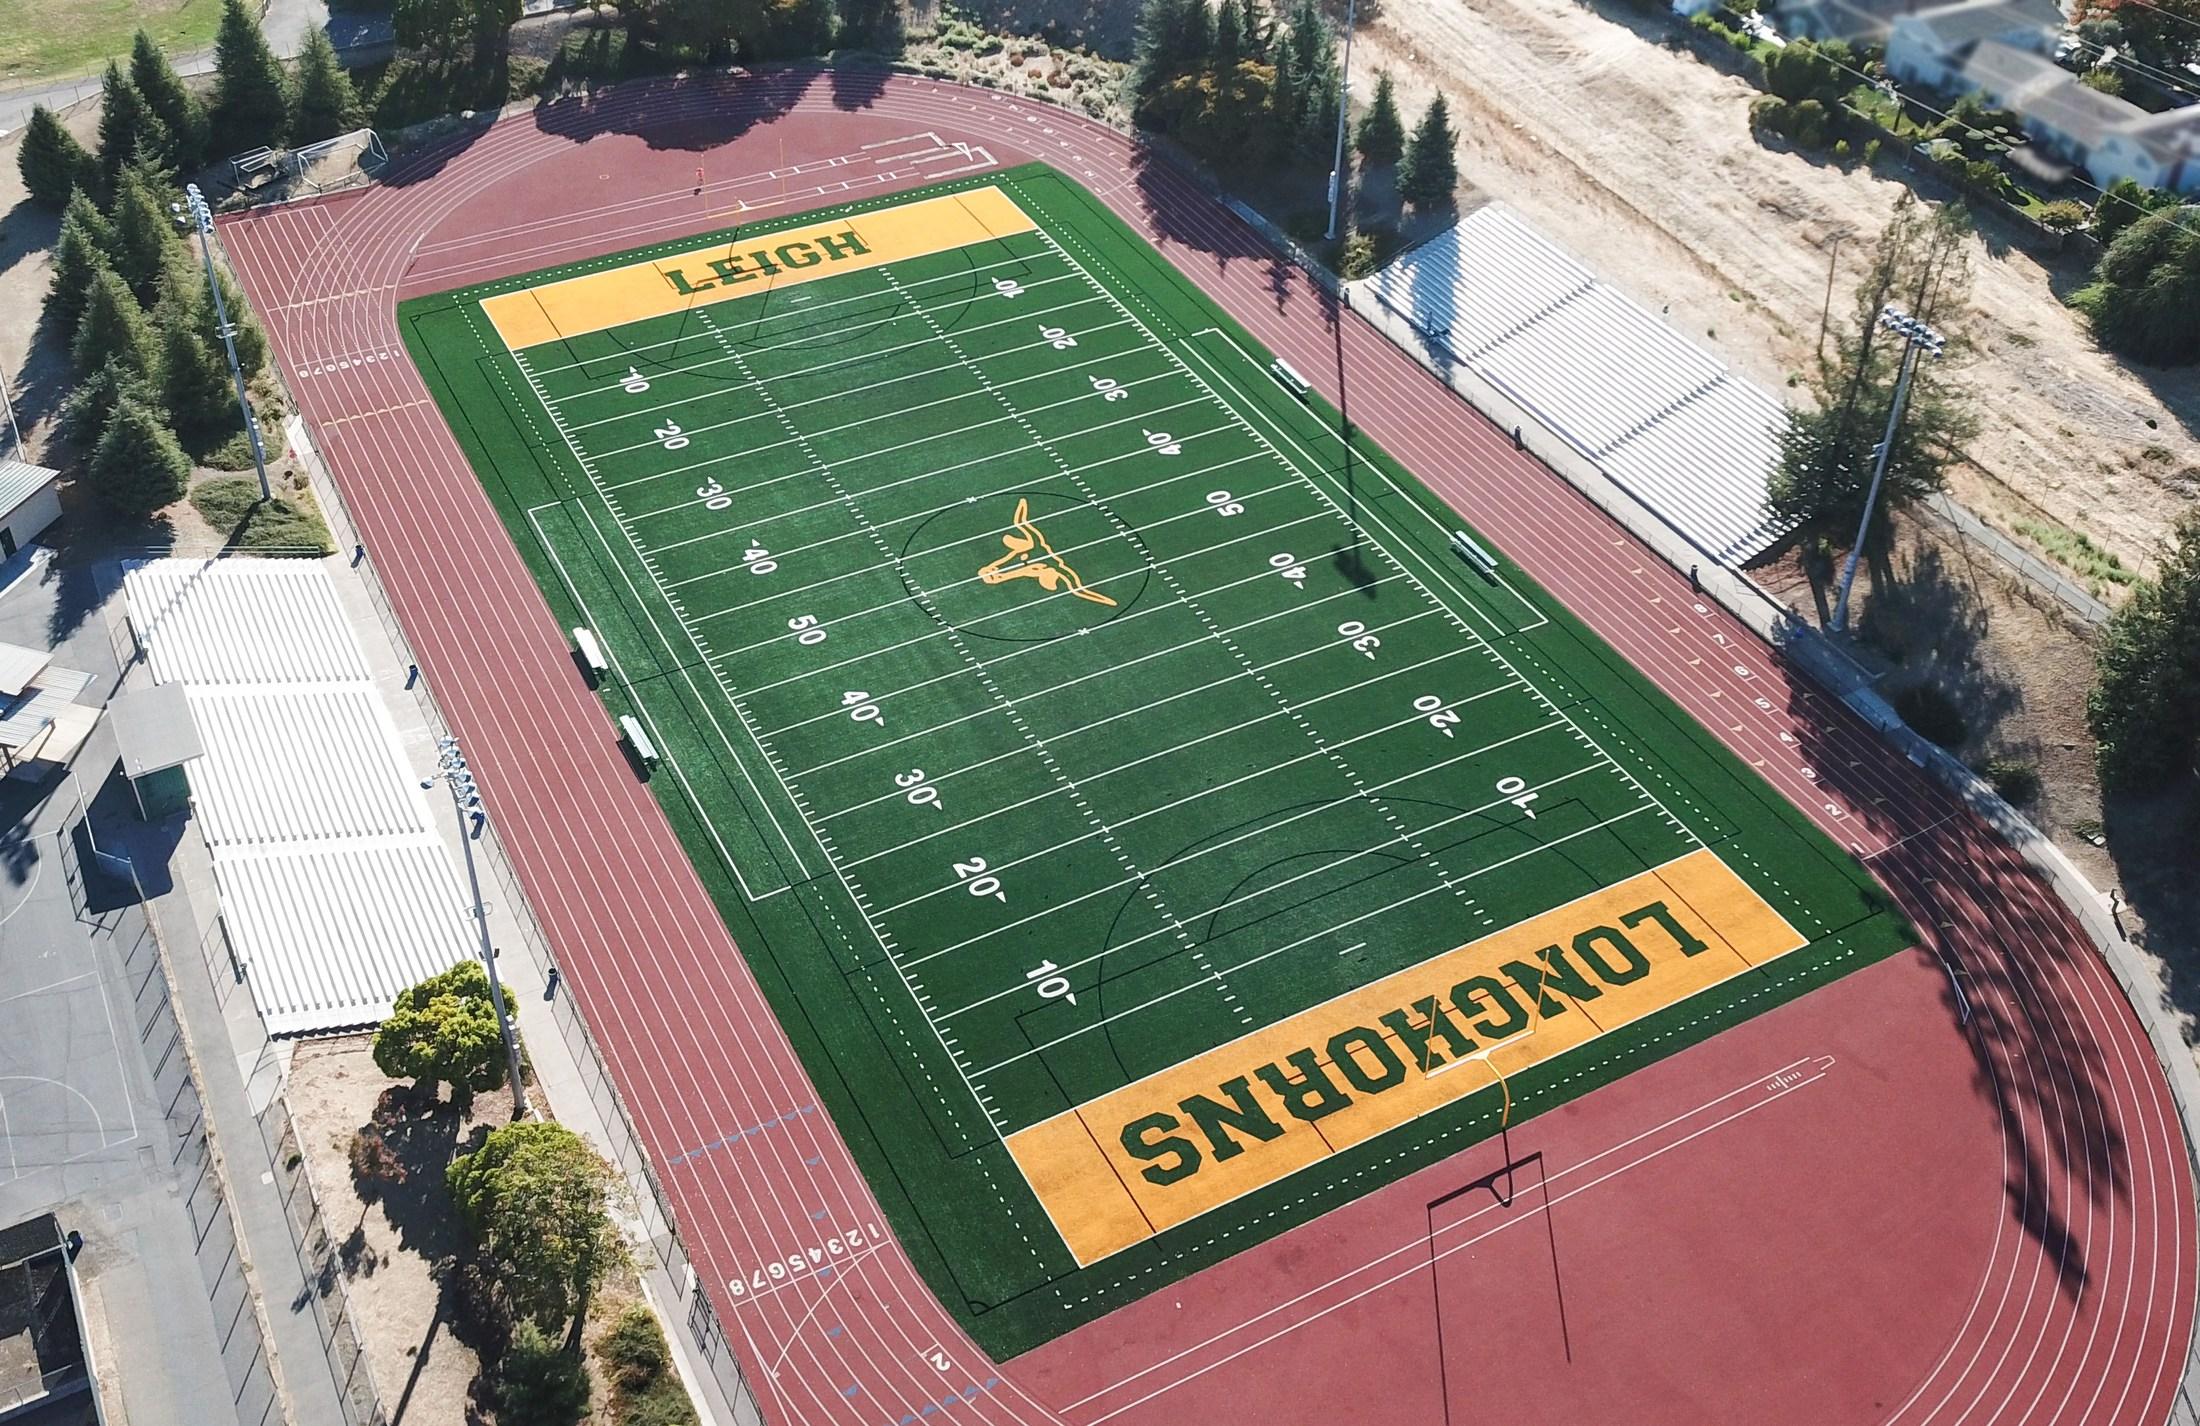 leigh high school football field